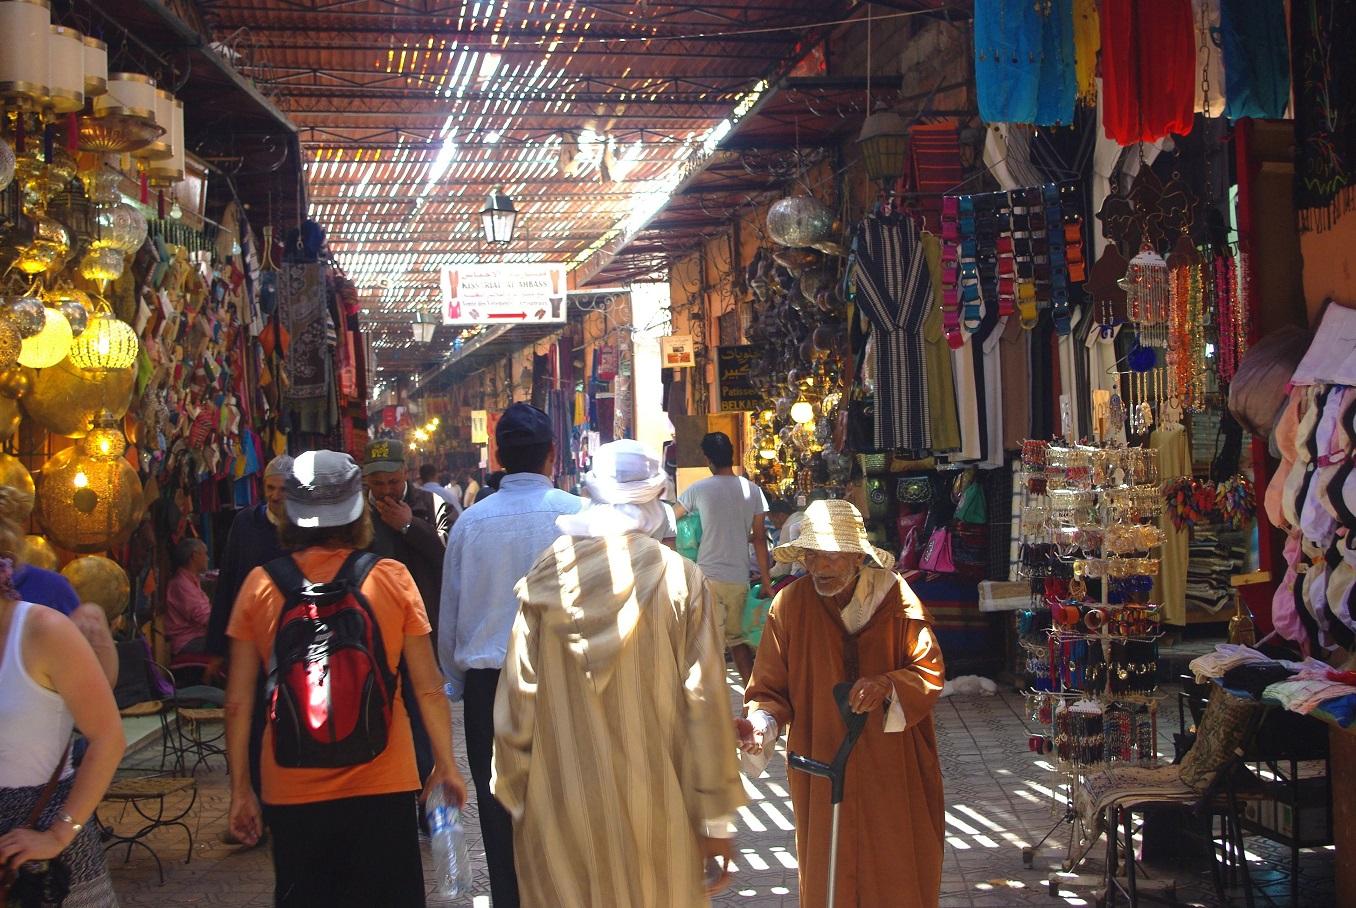 souk semmarine marrakech - visite et circuits depuis jemaa el fna